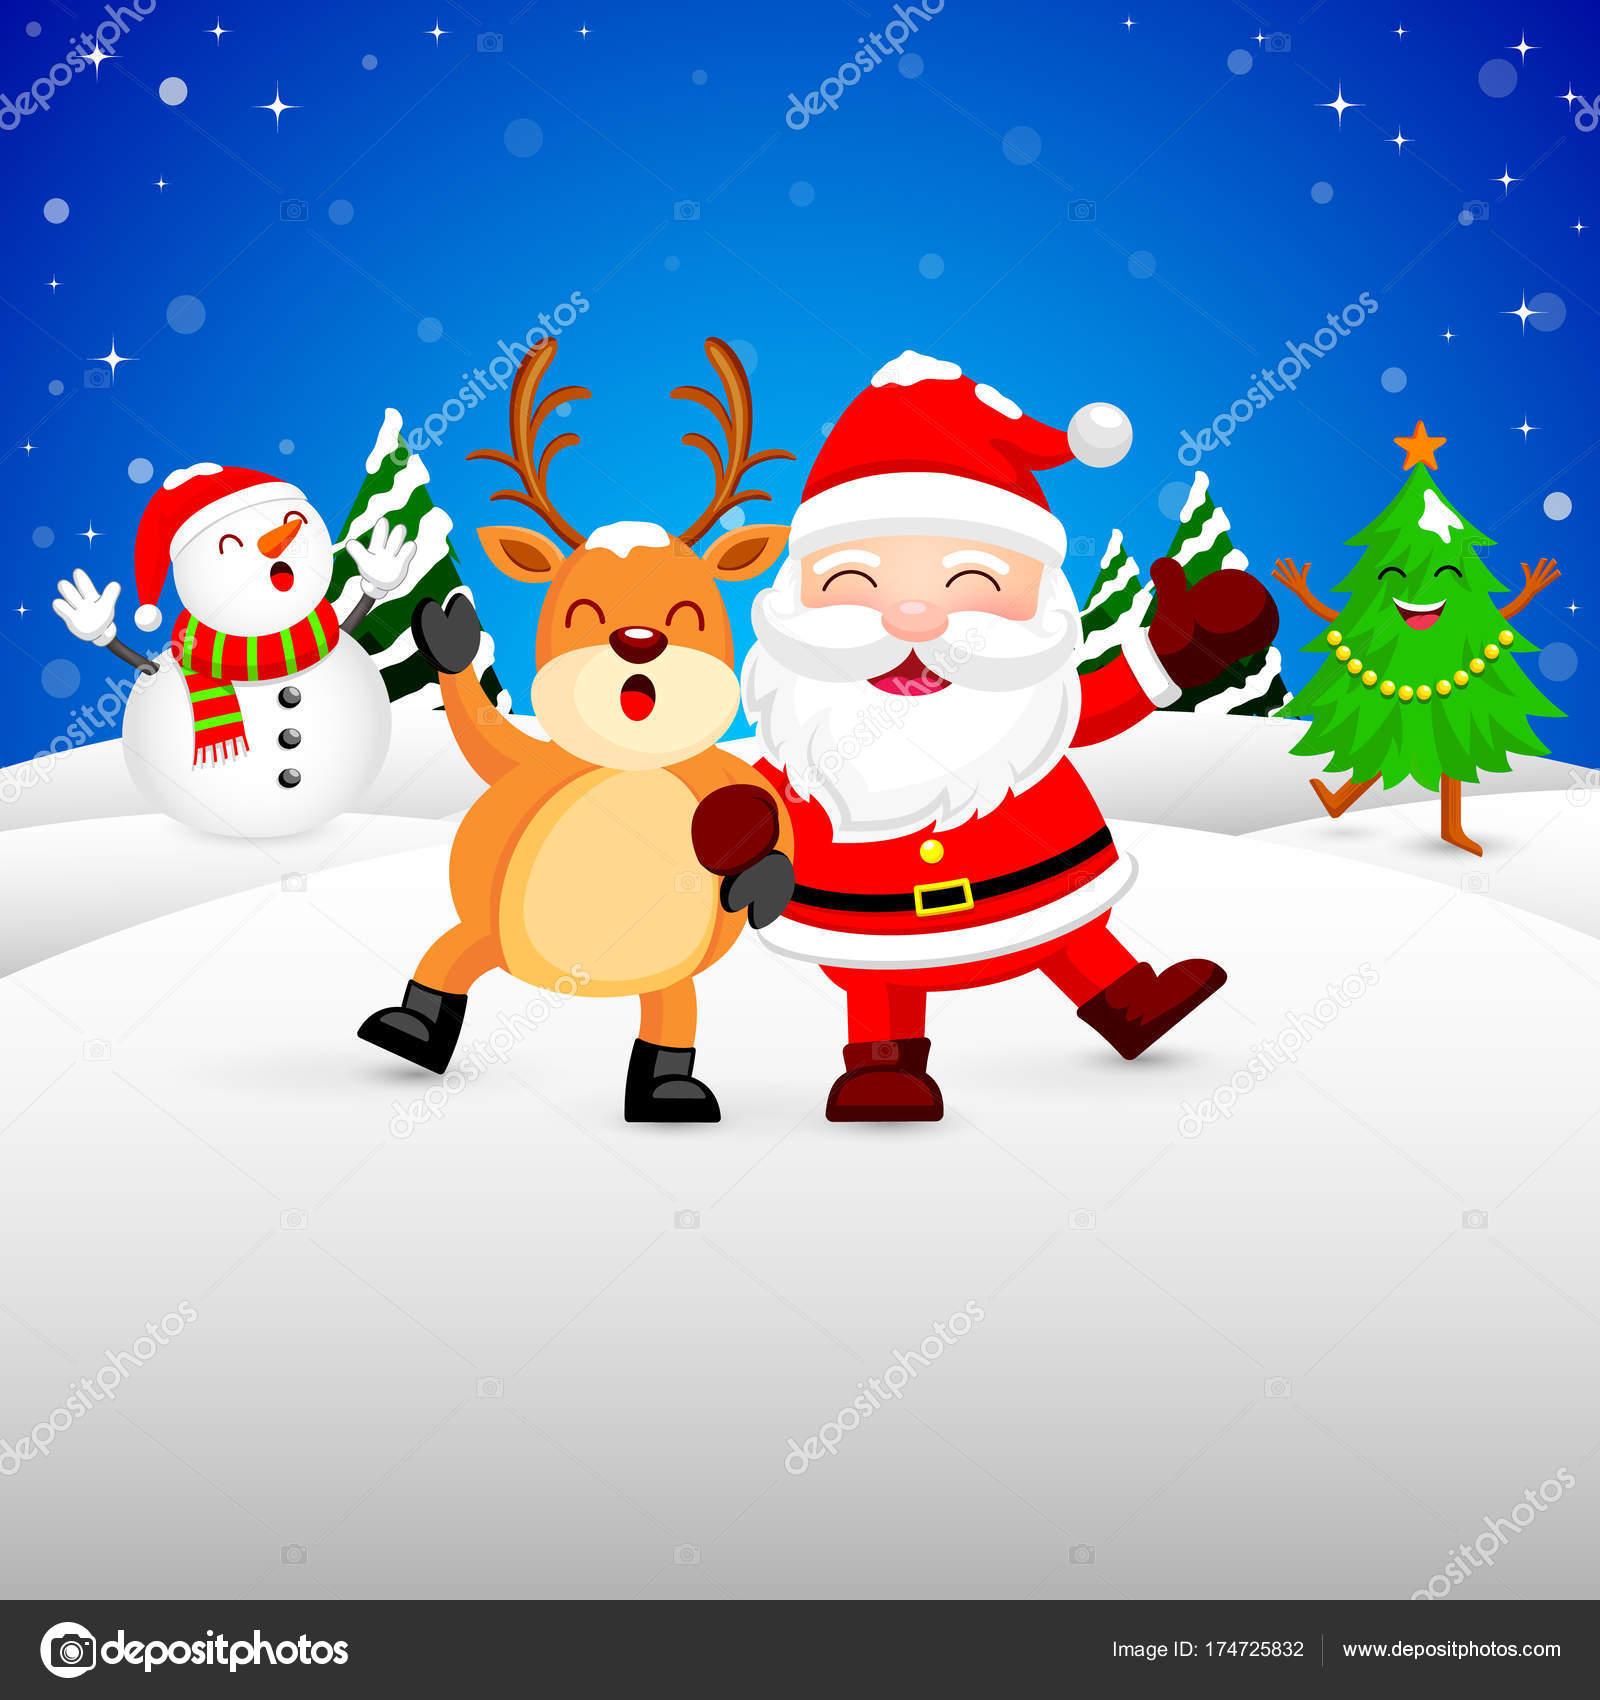 Funny Christmas.Funny Christmas Characters Design On Snow Santa Claus